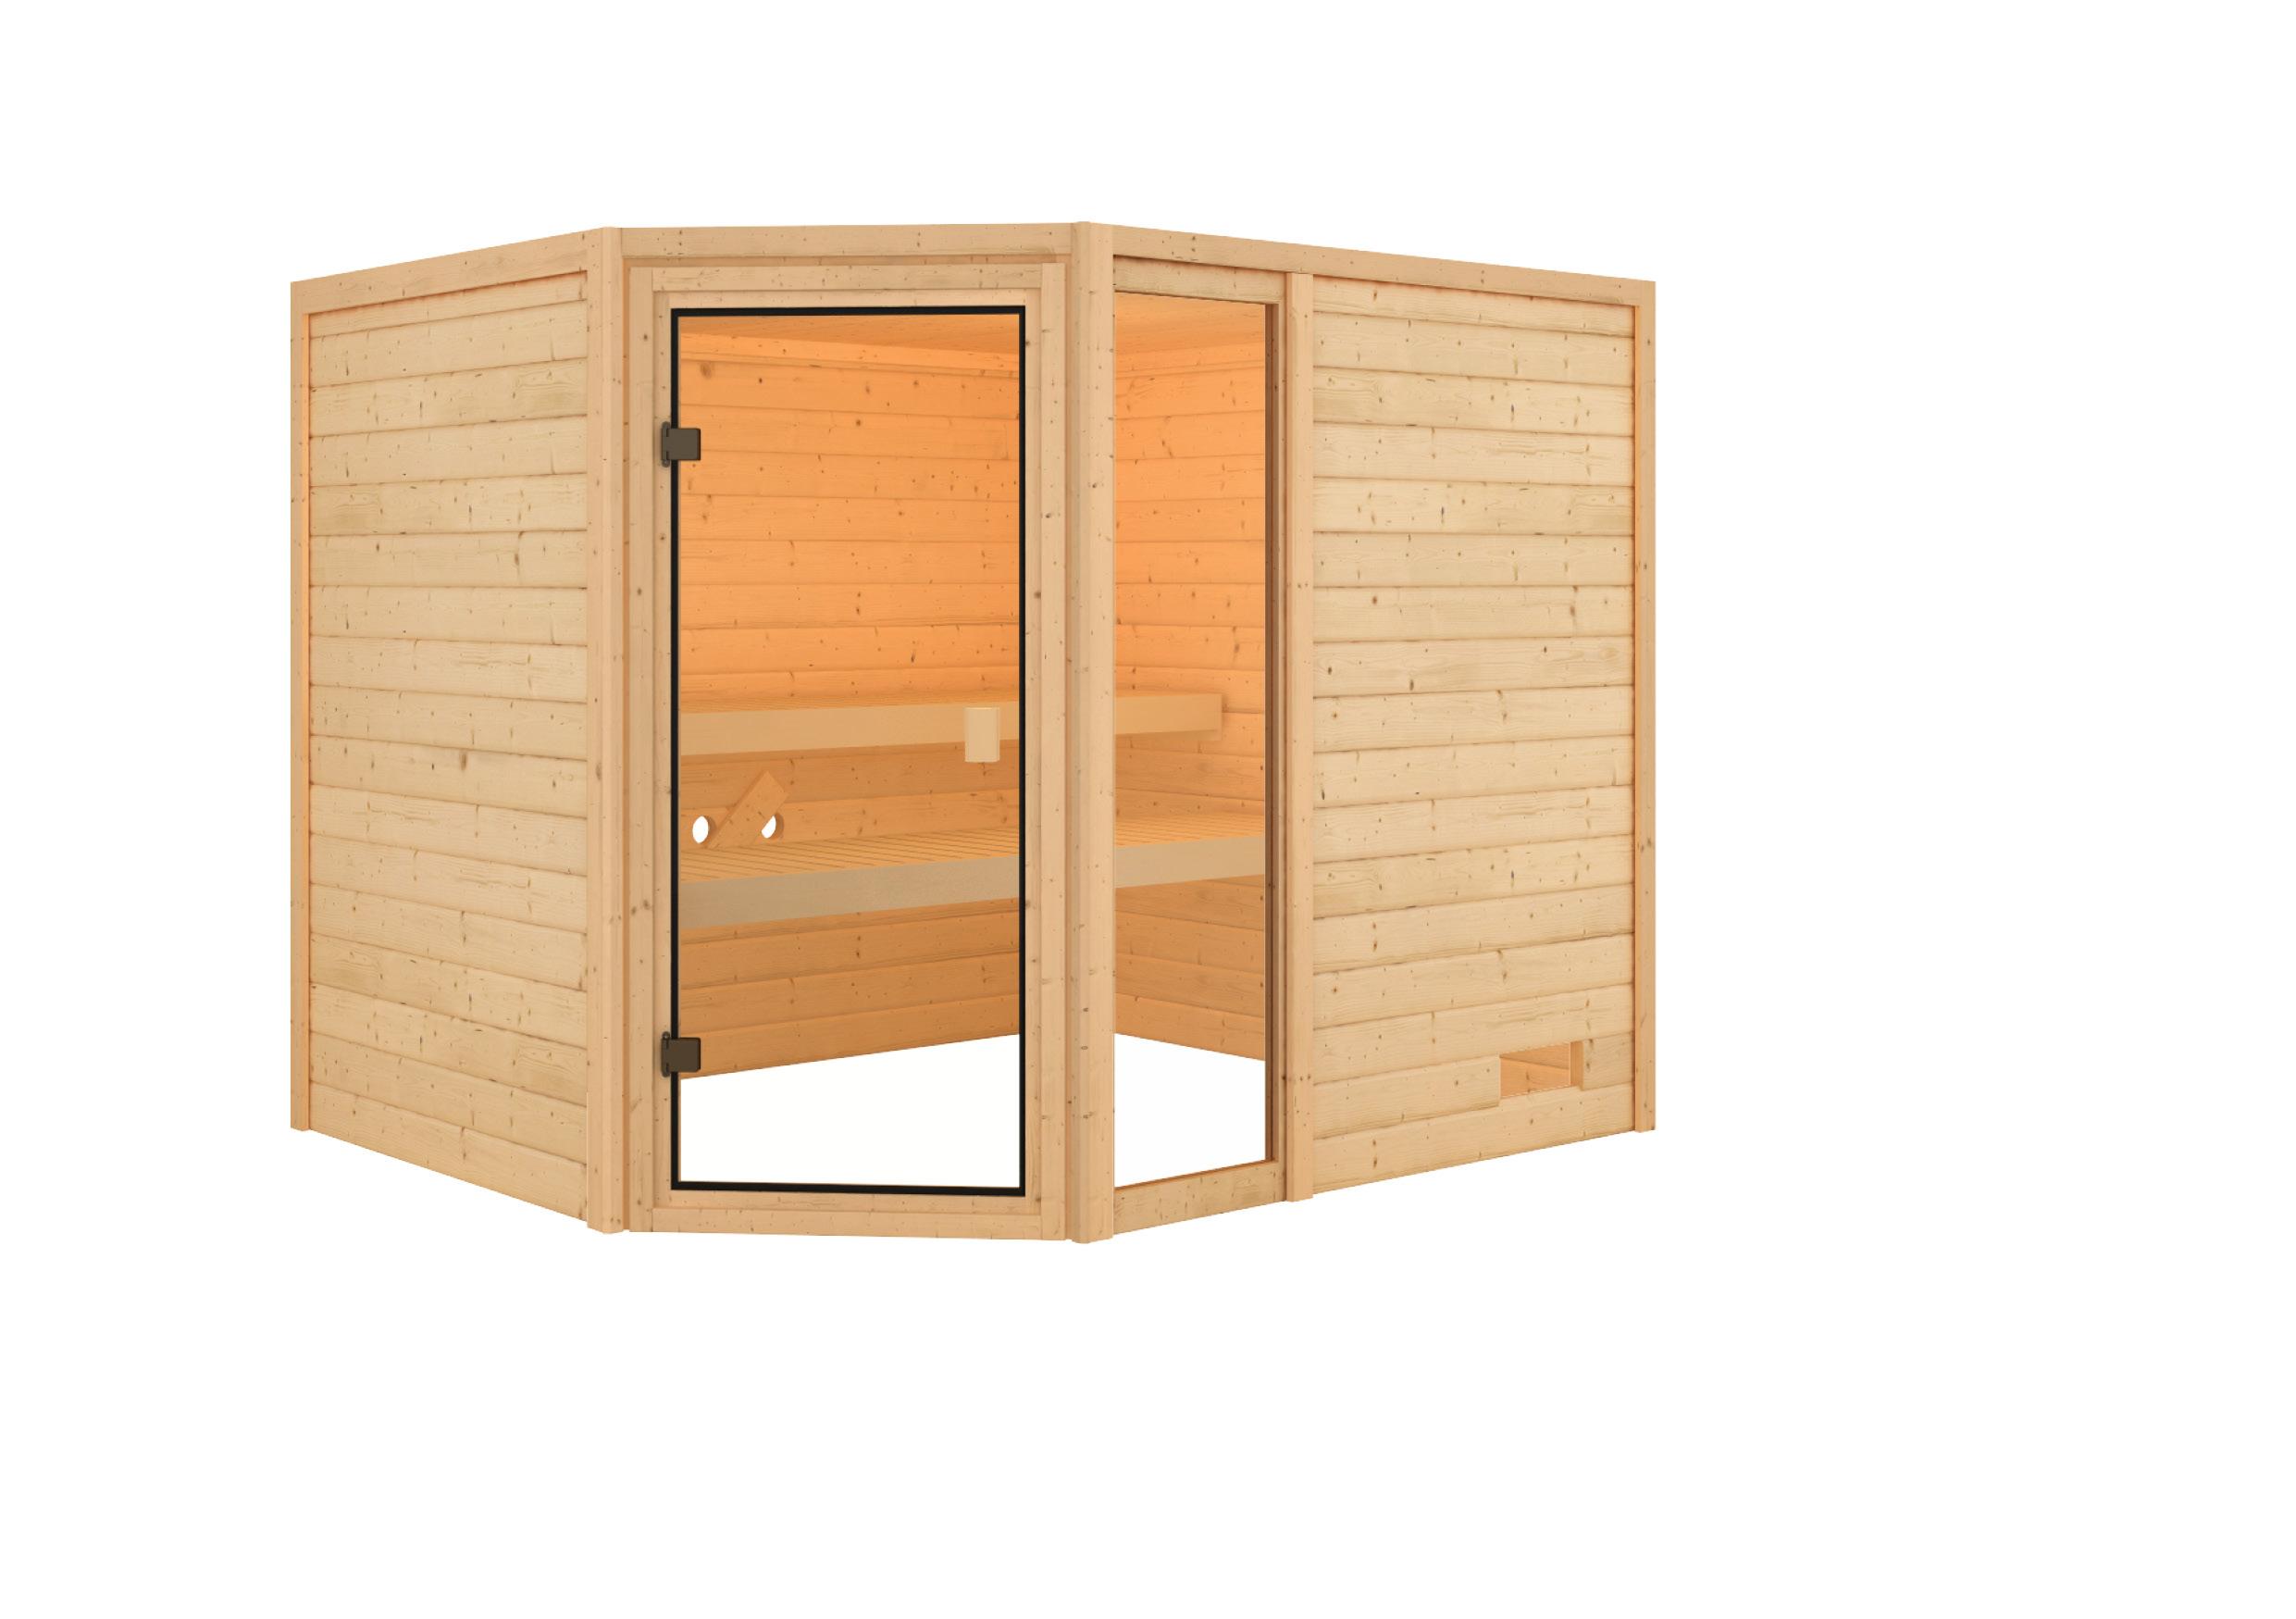 Woodfeeling Sauna Lola 38mm ohne Saunaofen Bild 3